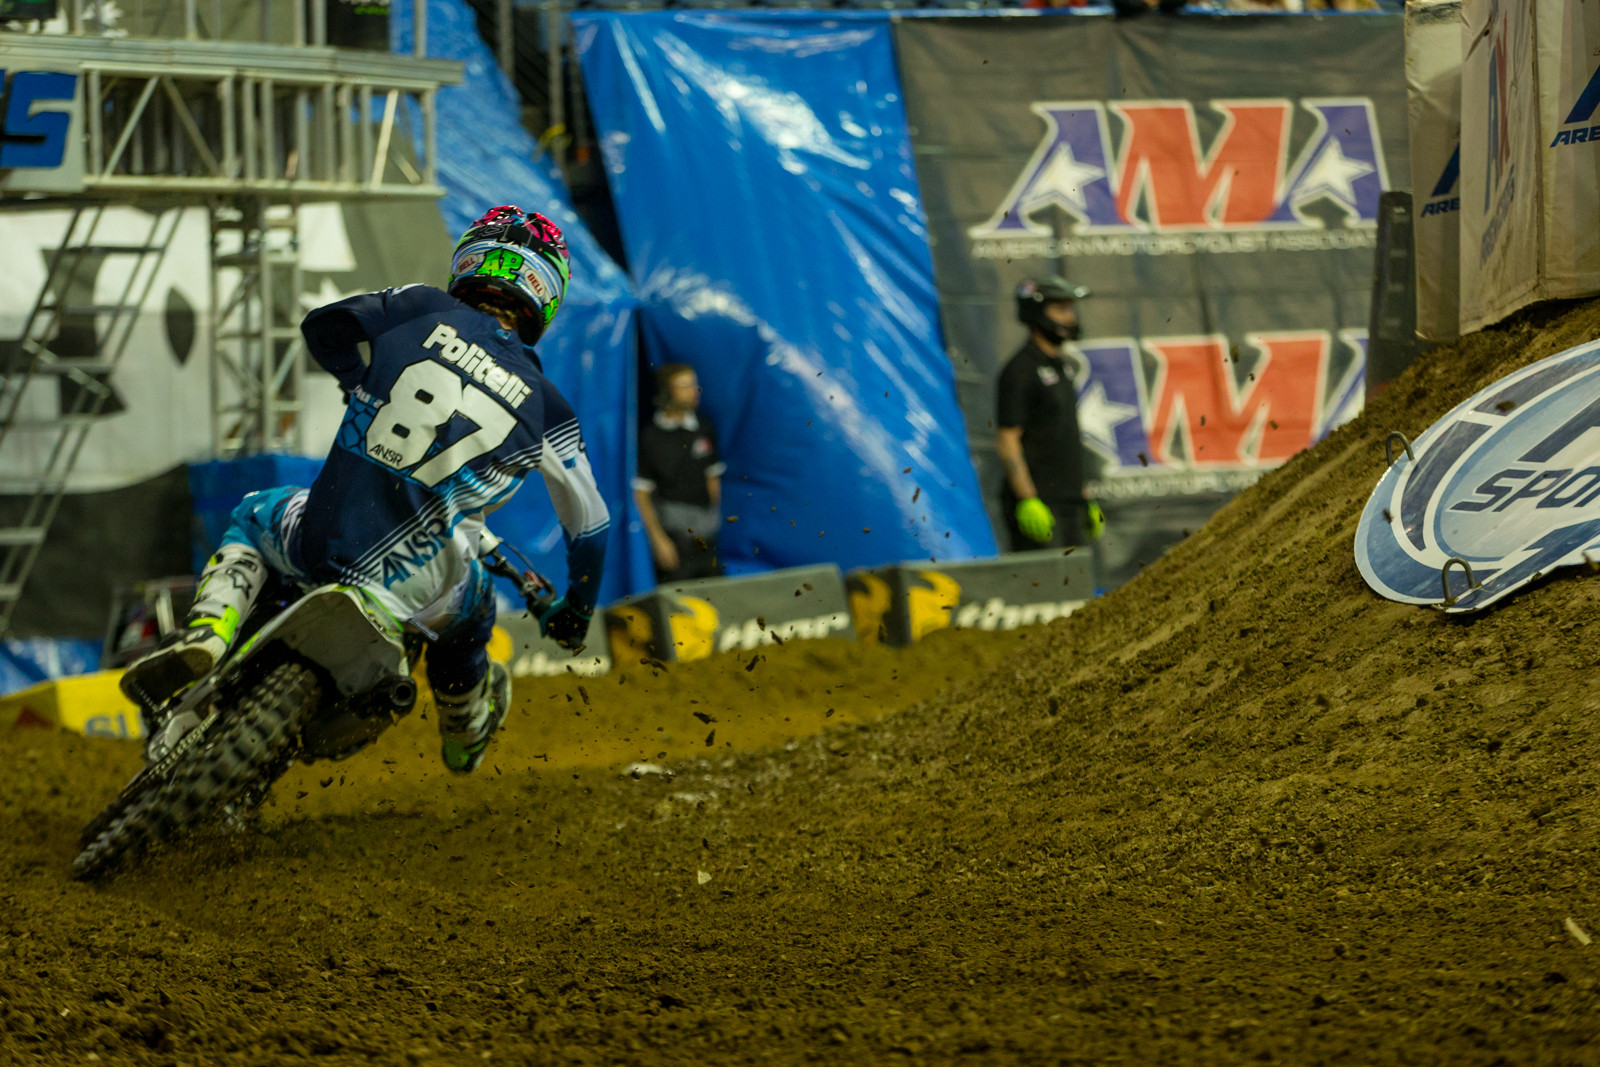 Austin Politelli - Photo Gallery: Ontario Arenacross - Saturday Night - Motocross Pictures - Vital MX